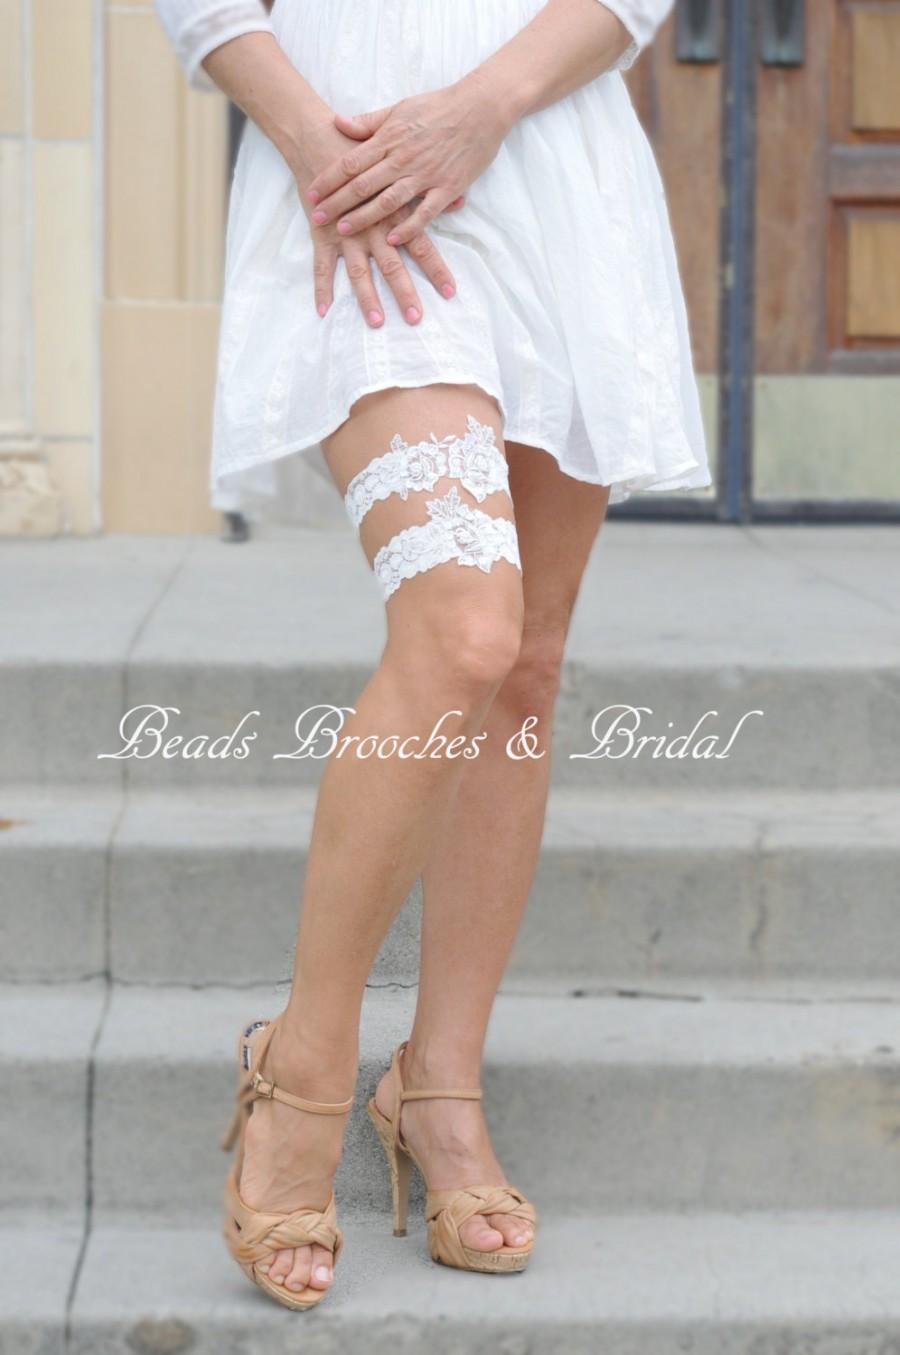 Свадьба - Off-white Rose Lace Wedding Garter Set,Bridal Flower Garter,Pearls and Sequins Wedding Garter,Brial Garter Set, White Stretch Lace Garter